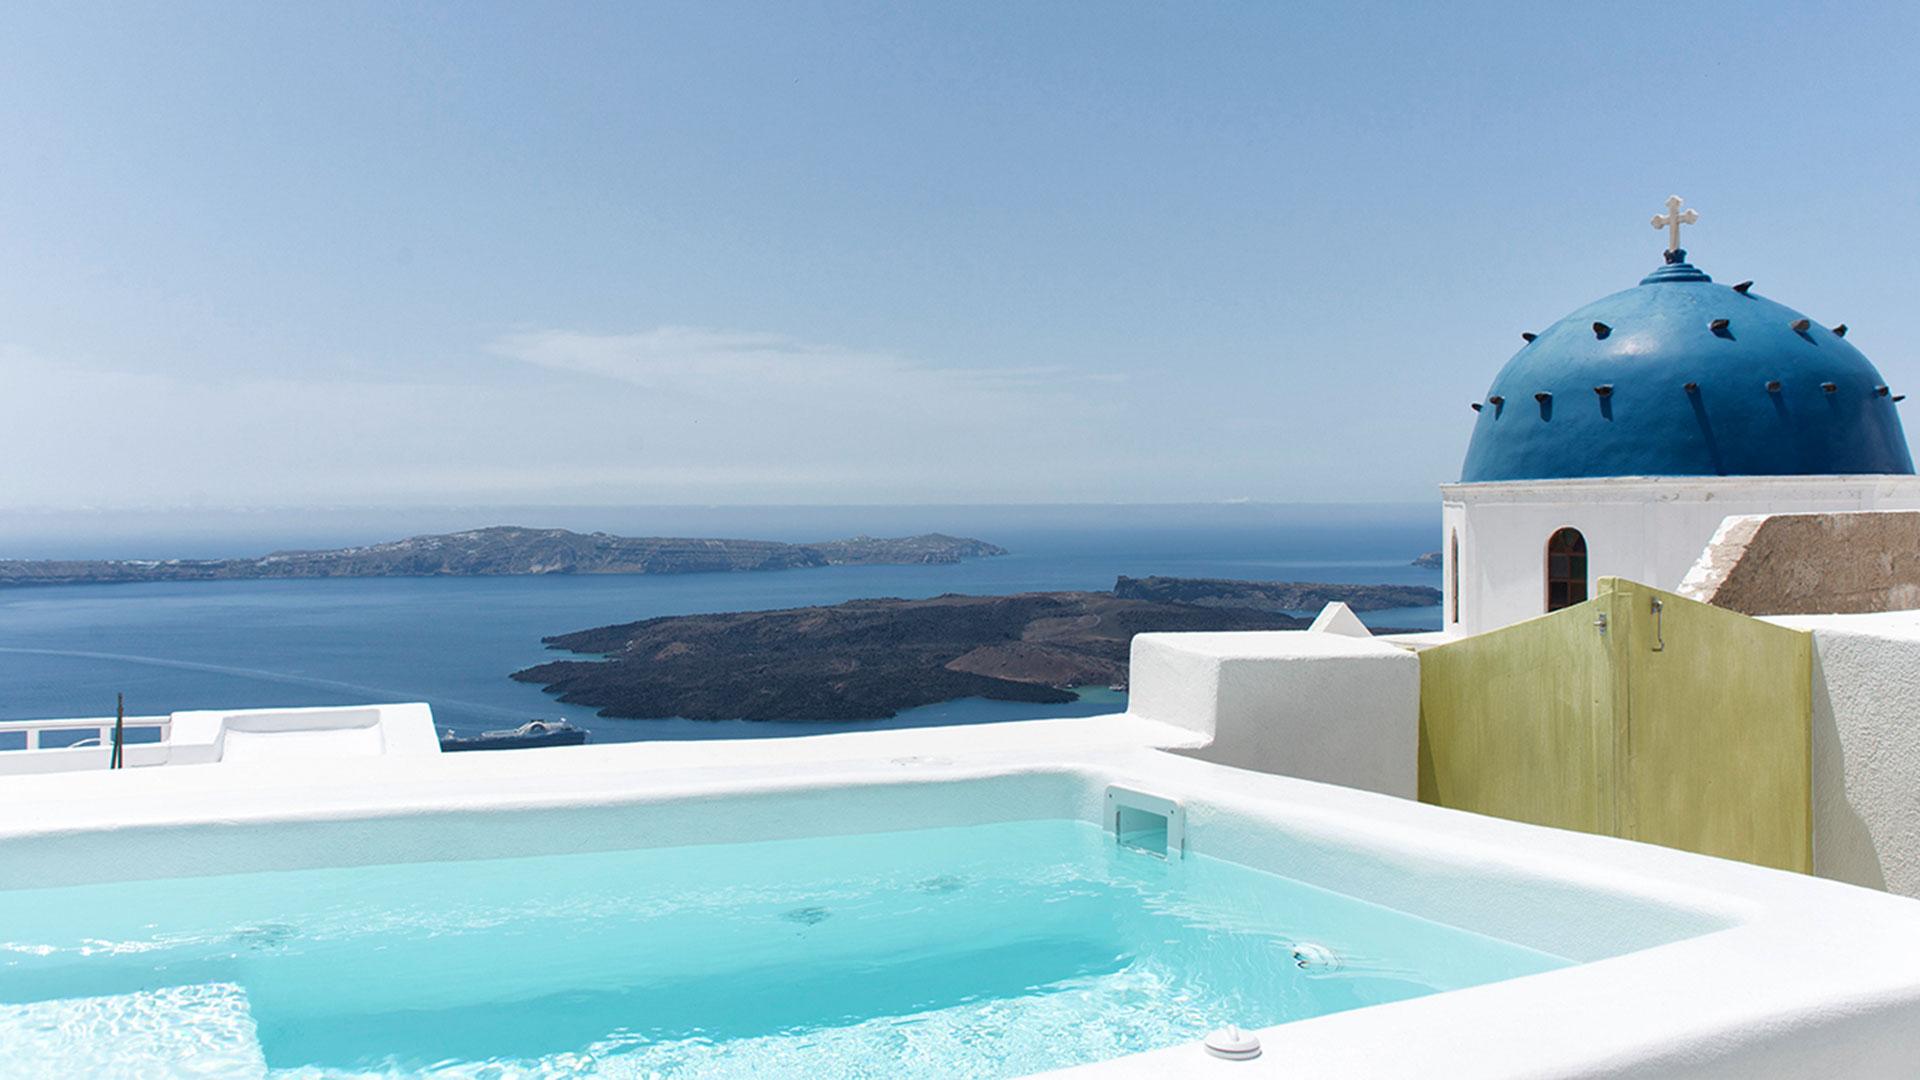 Apartments Santorini Island Accommodation With Caldera